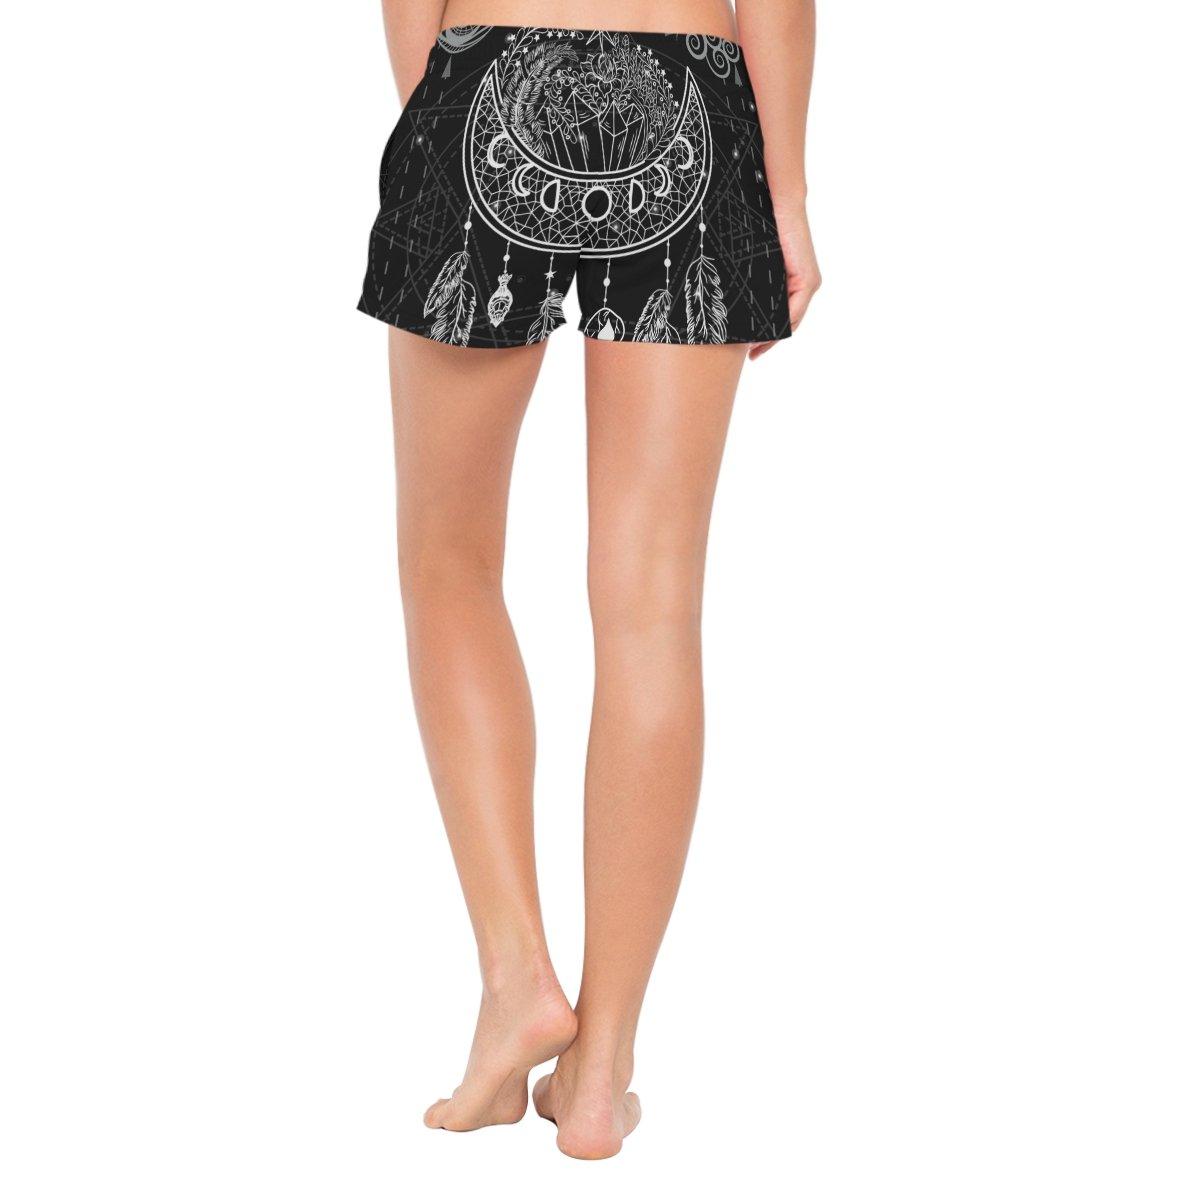 Cooper girl ALAZA Beautiful Dreamcatcher Womens Shorts Beach Summer Drawstring Casual Shorts